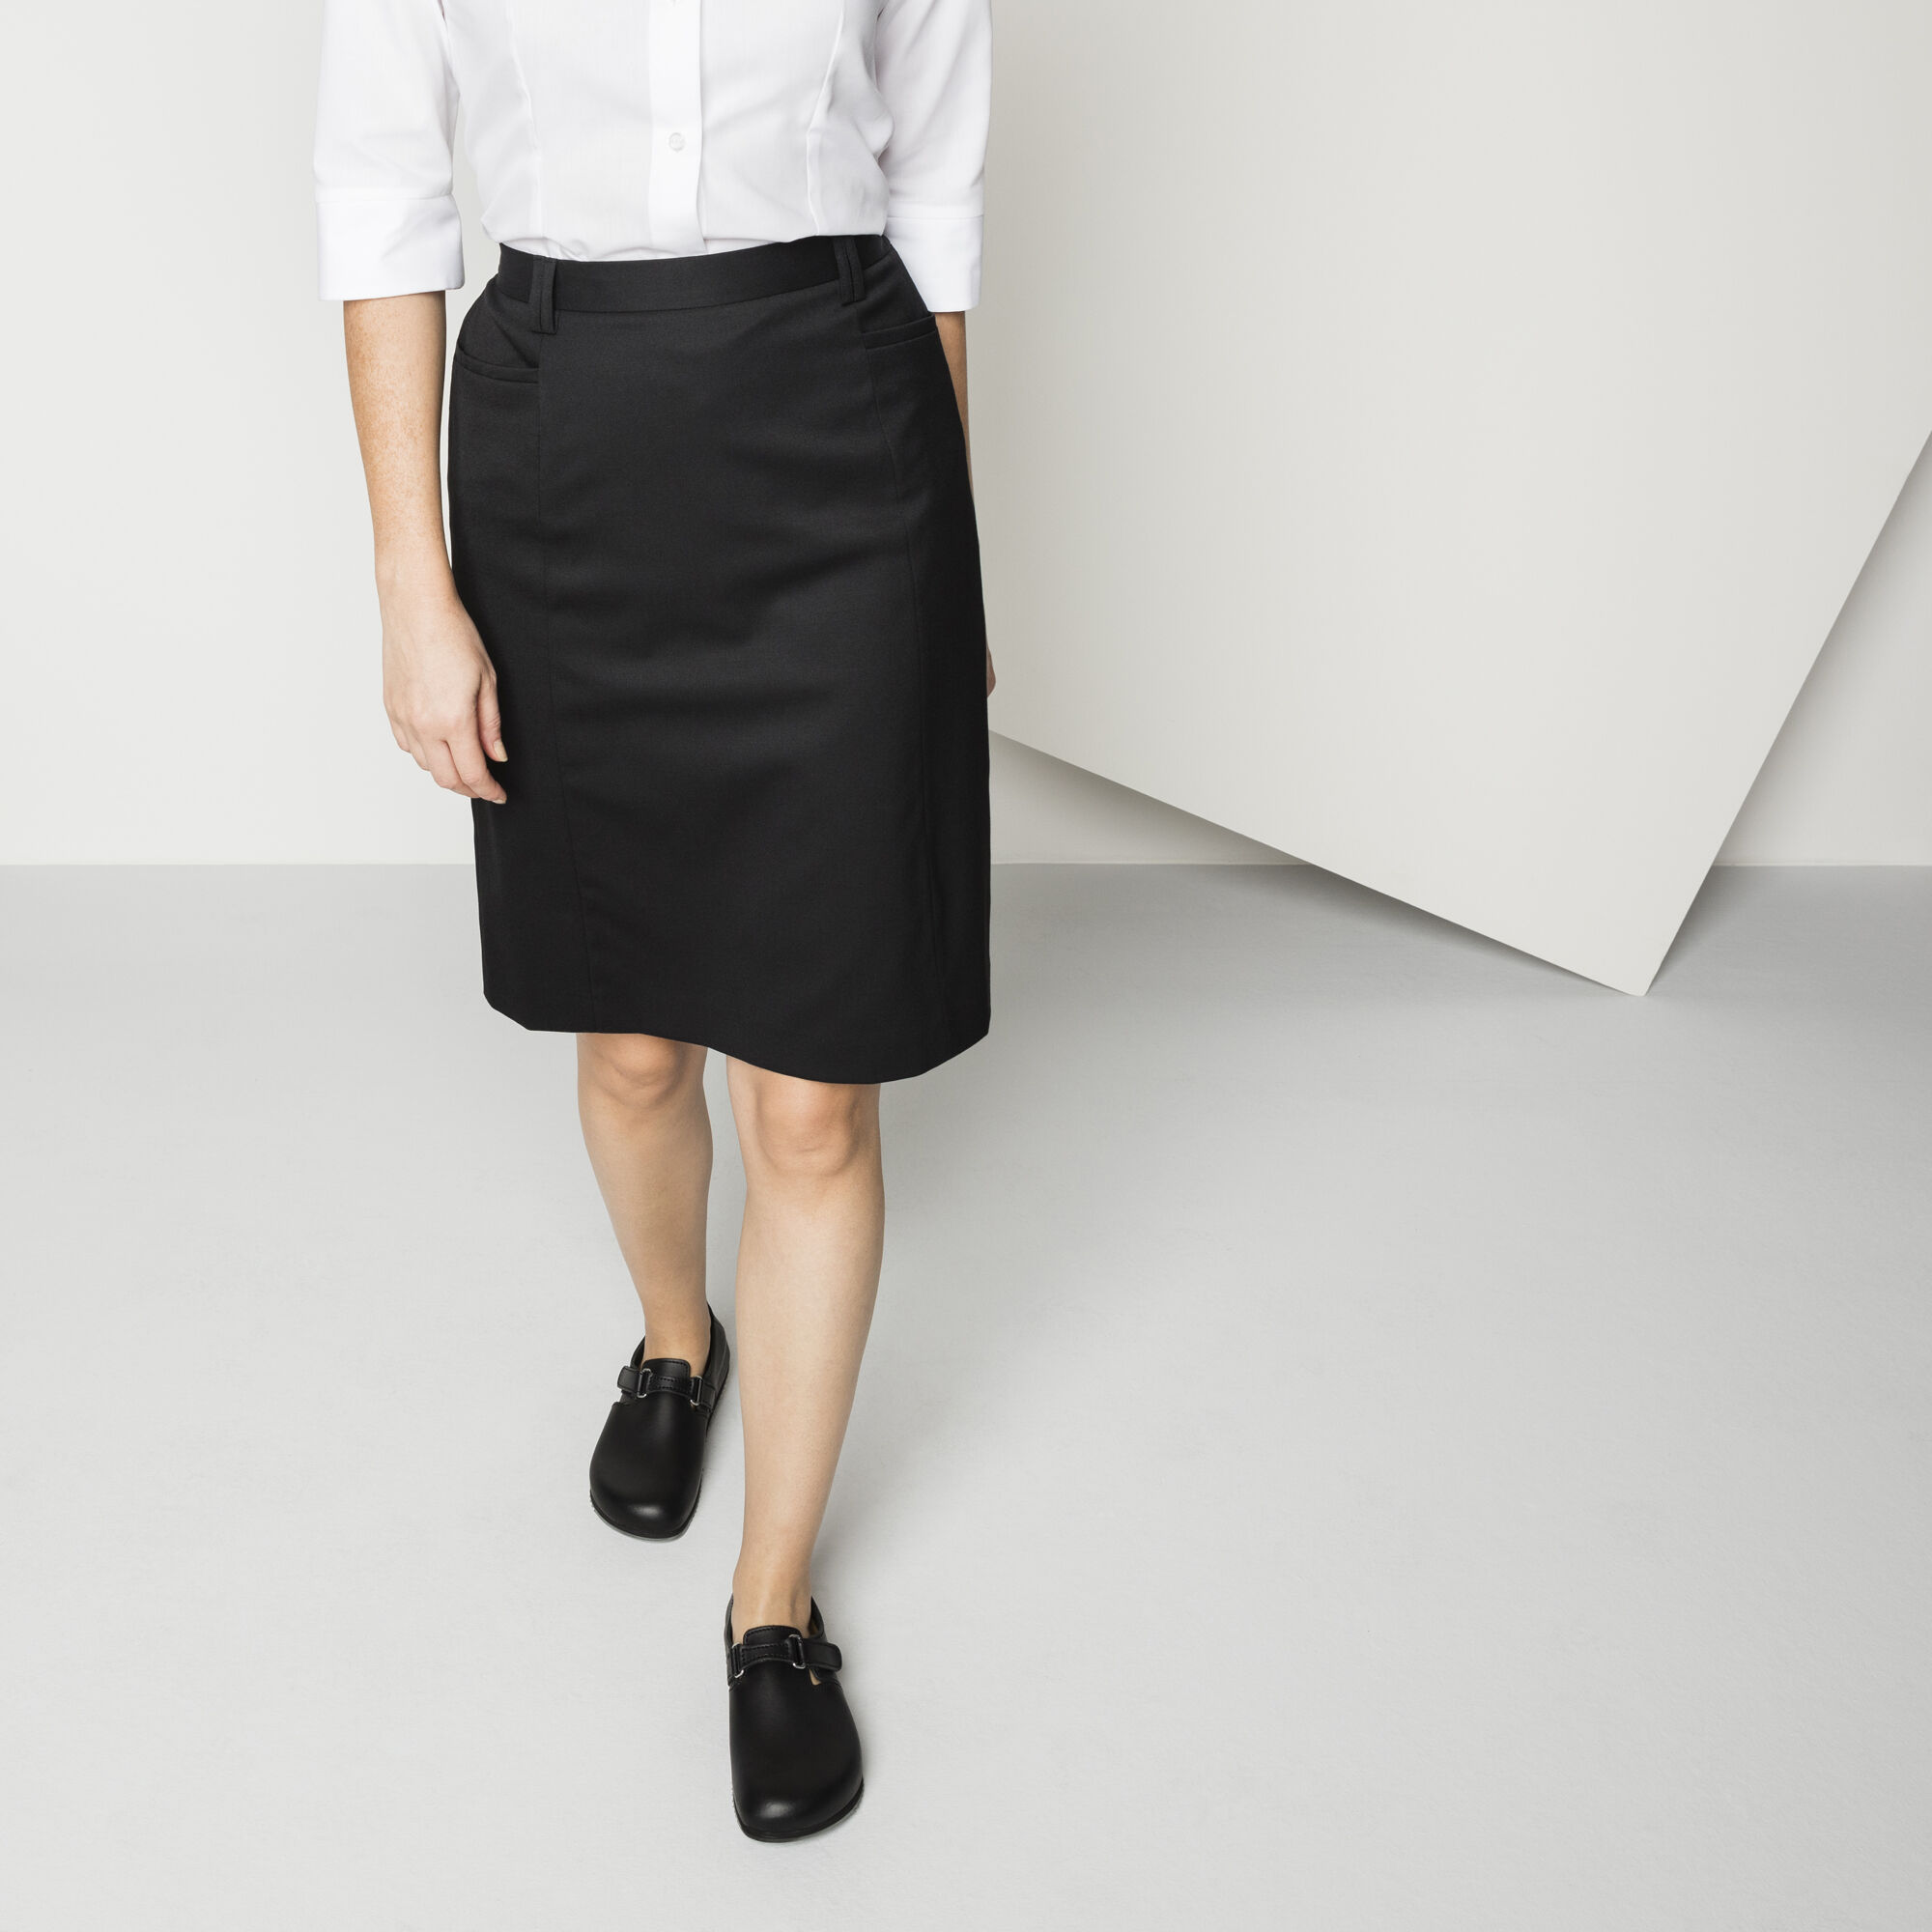 Linz Natural Leather Black | shop